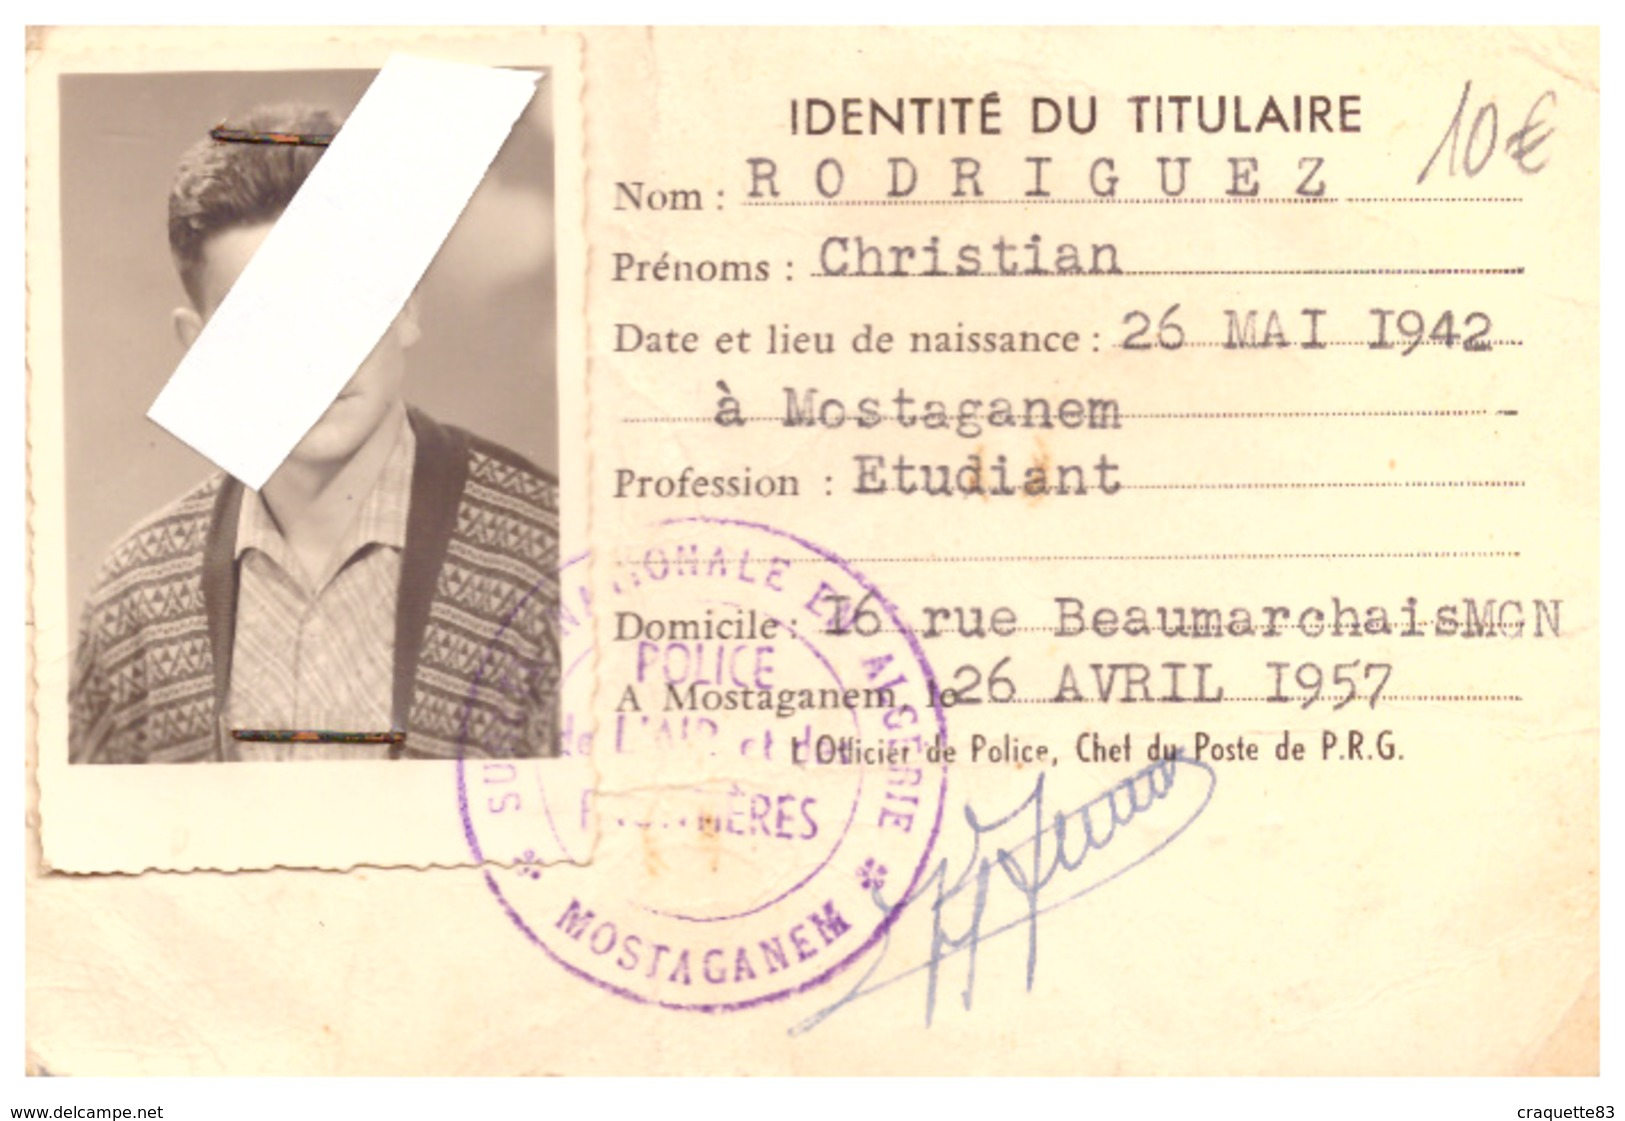 CARTE PORTUAIRE N°1909 - PORT DE MOSTAGANEM   1957  MOSTAGANEM   YATCH CLUB DE MOSTAGANEM - Kaarten